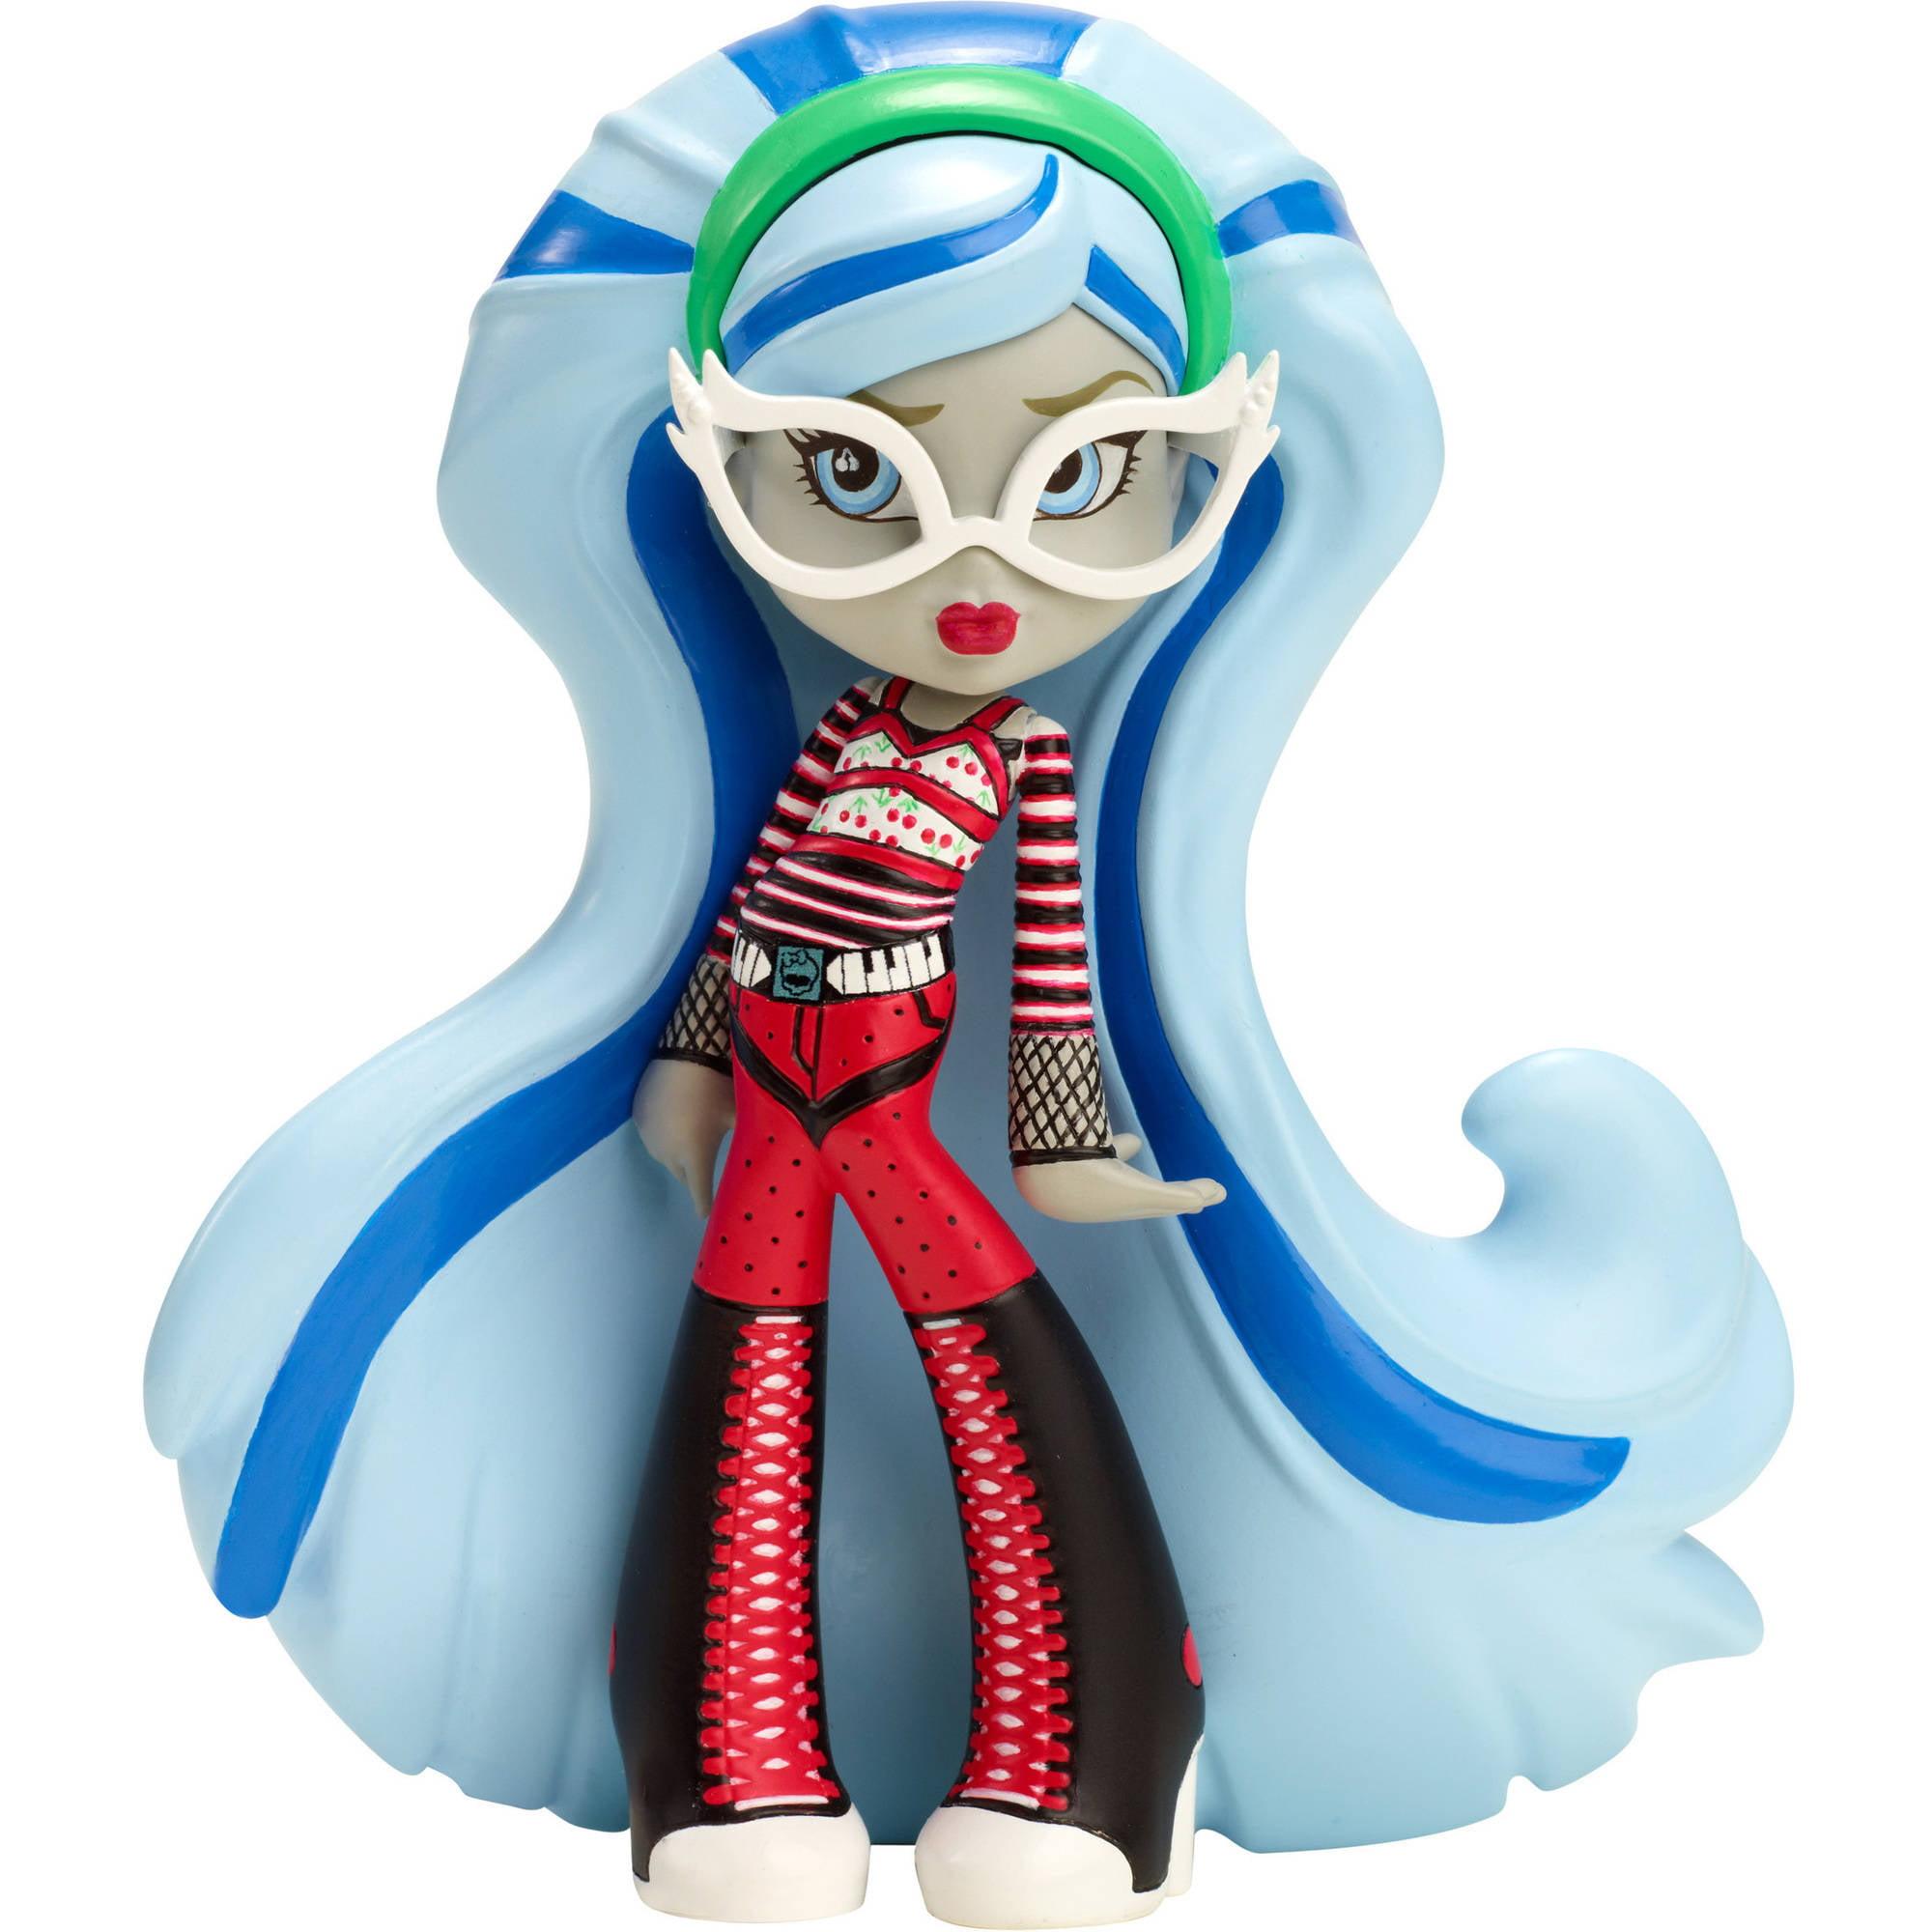 Monster High Vinyl Ghoulia Yelps Figure